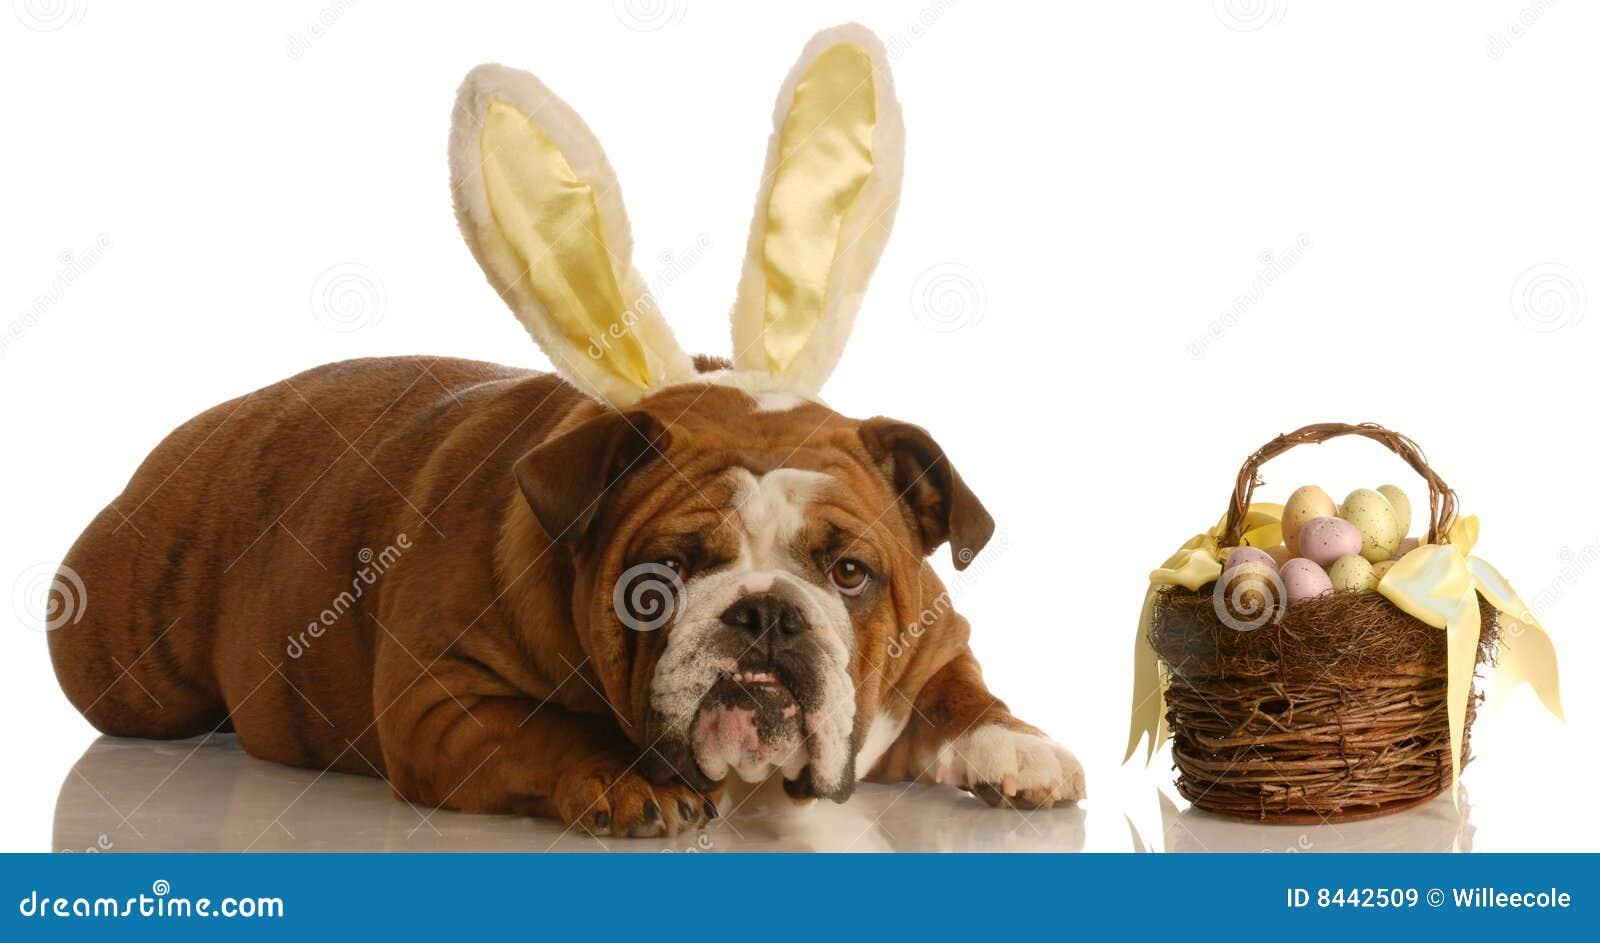 Bulldog dressed as easter bunny